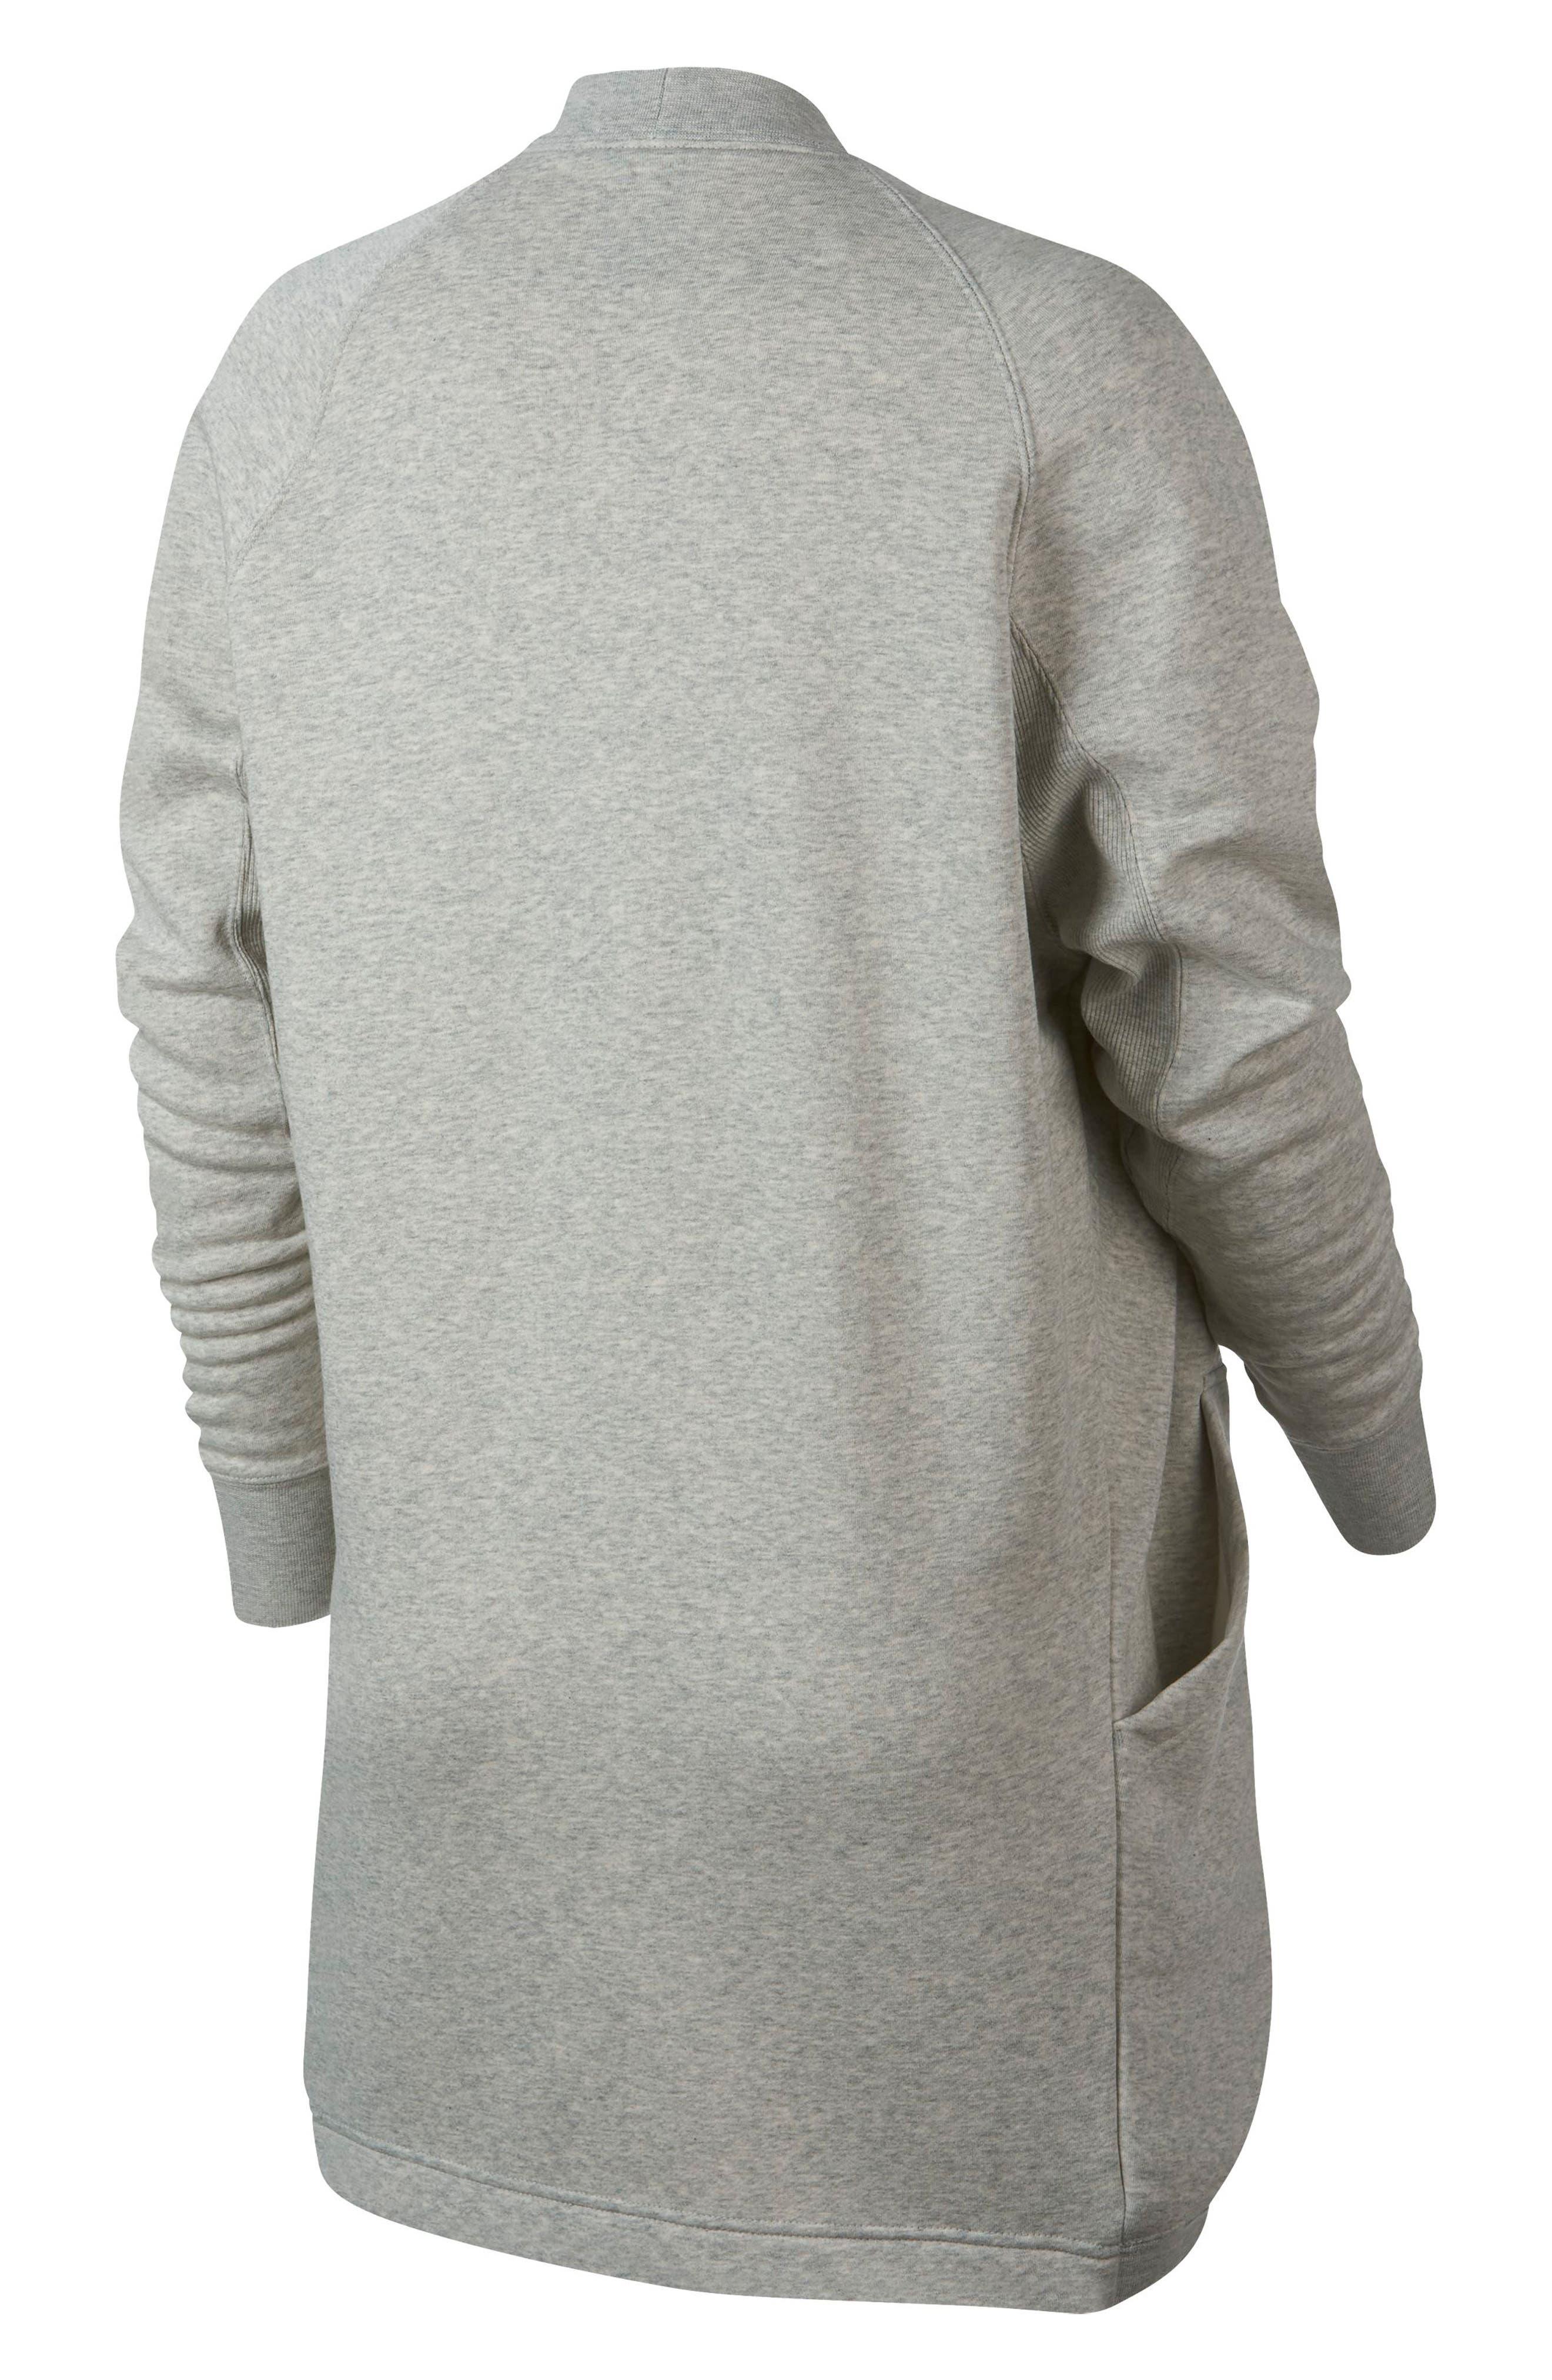 Sportswear Rally Cardigan,                             Alternate thumbnail 6, color,                             GREY HEATHER/ PALE GREY/ WHITE